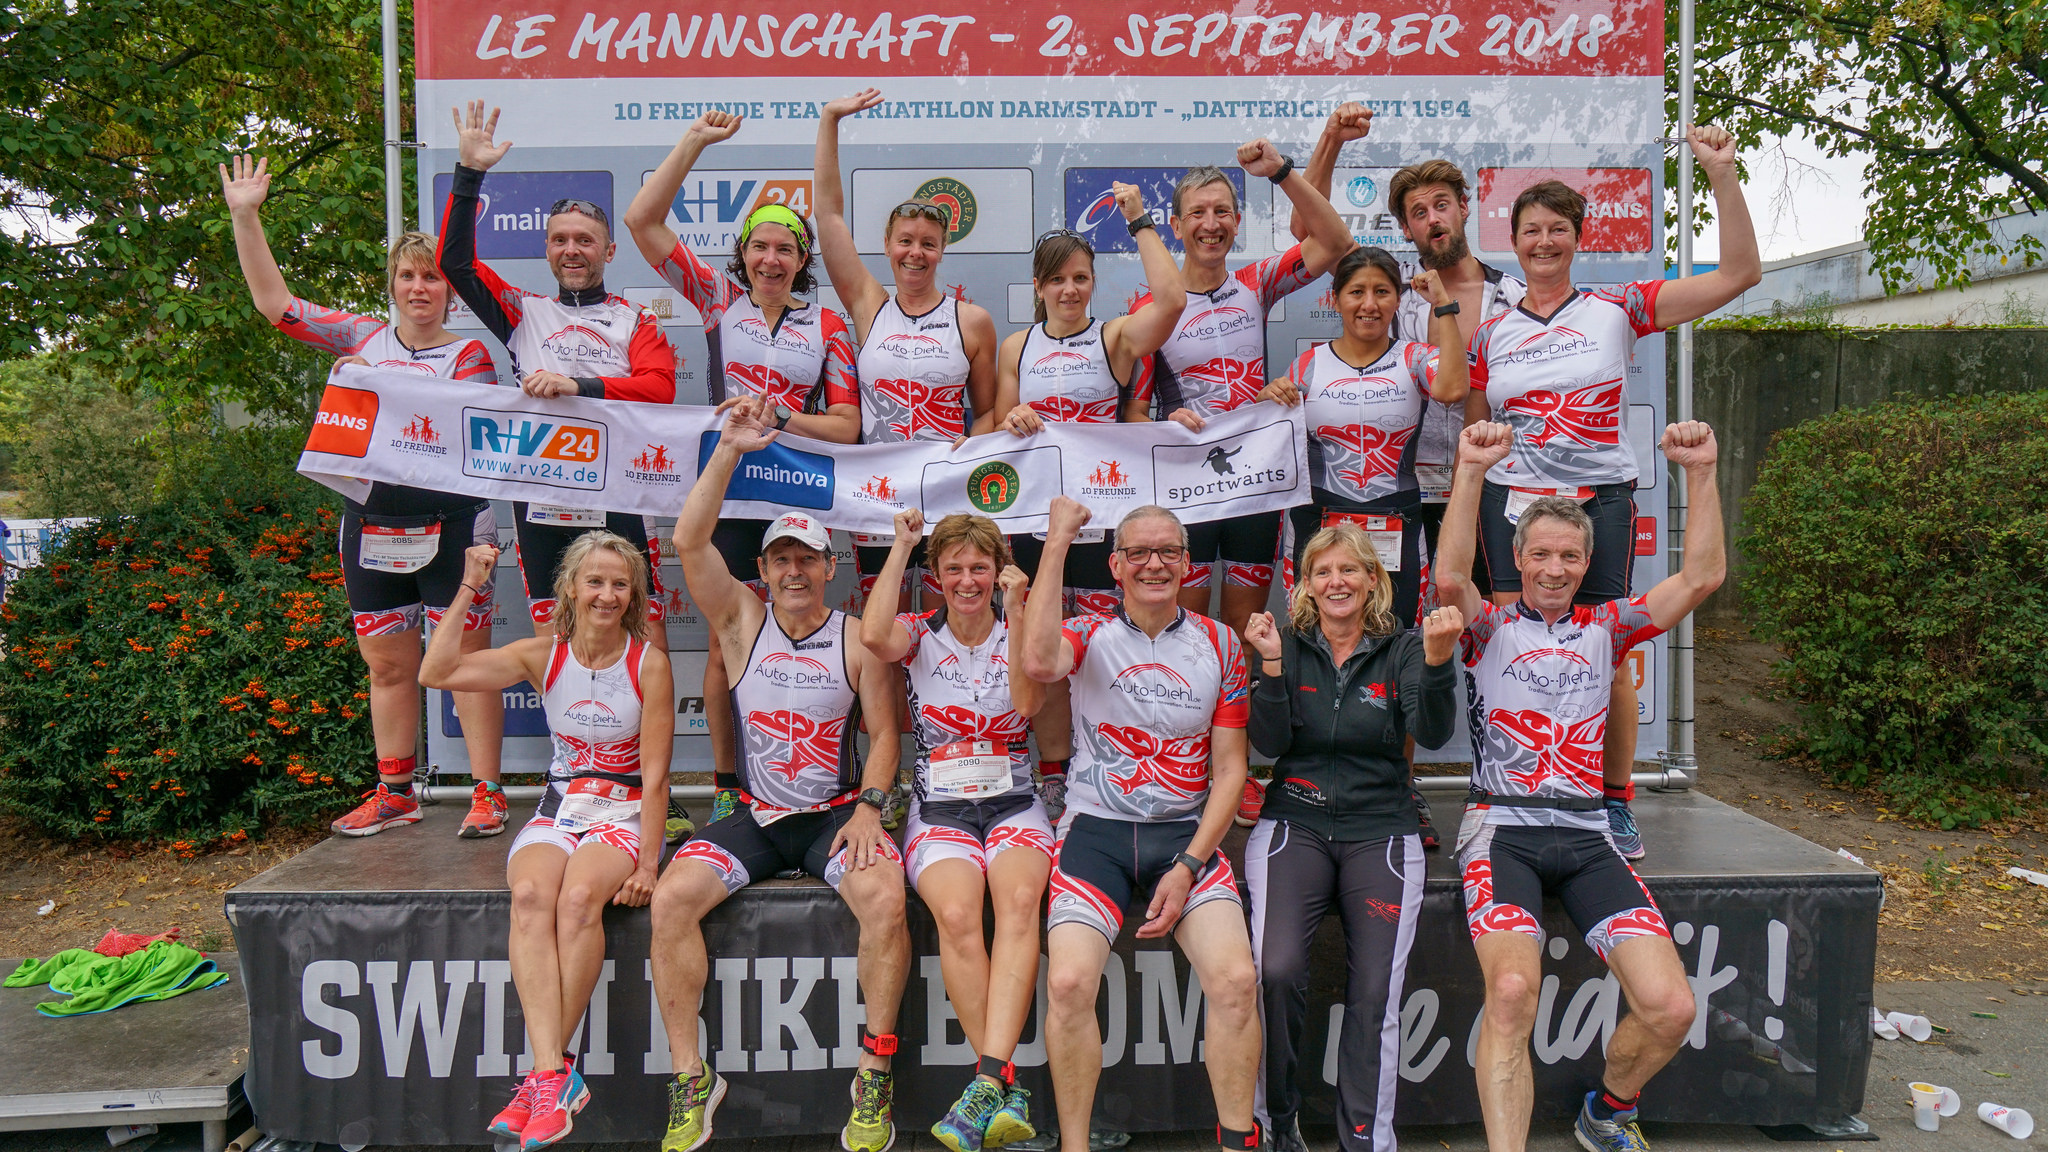 10 freunde triathlon frankfurt 2019